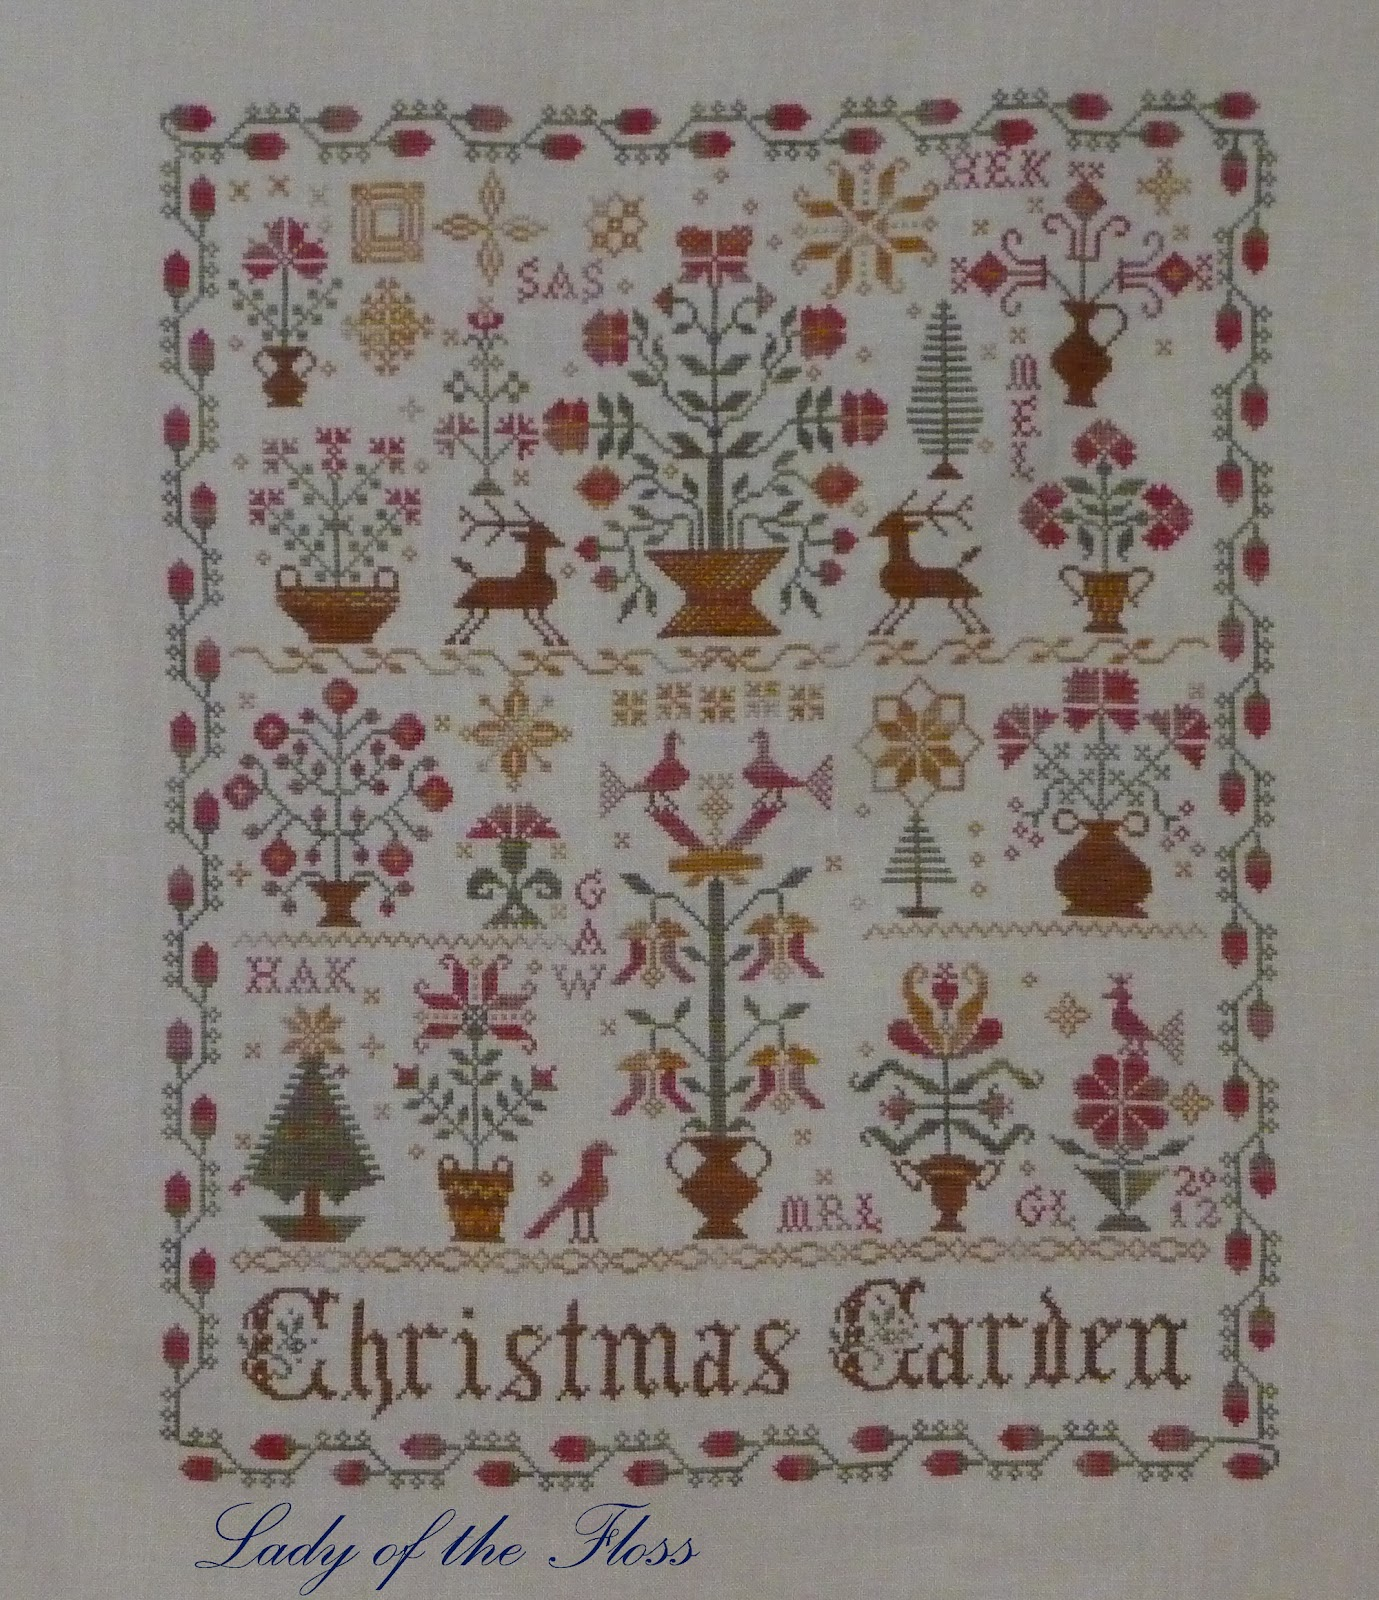 Lady of the floss april 2012 for Christmas garden blackbird designs